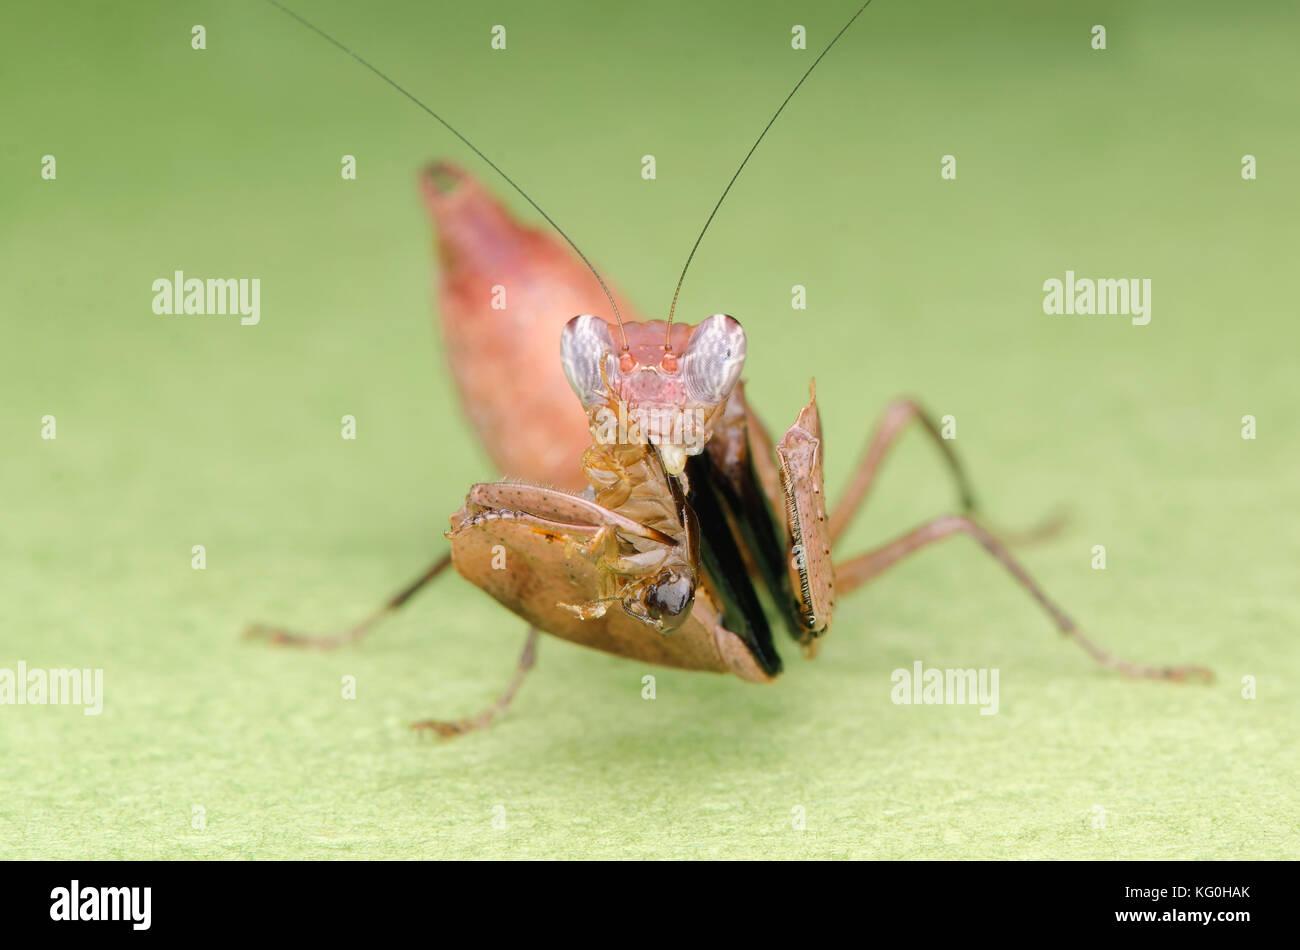 boxer mantis feeding on roach. brown praying mantis nymph. malaysia - Stock Image